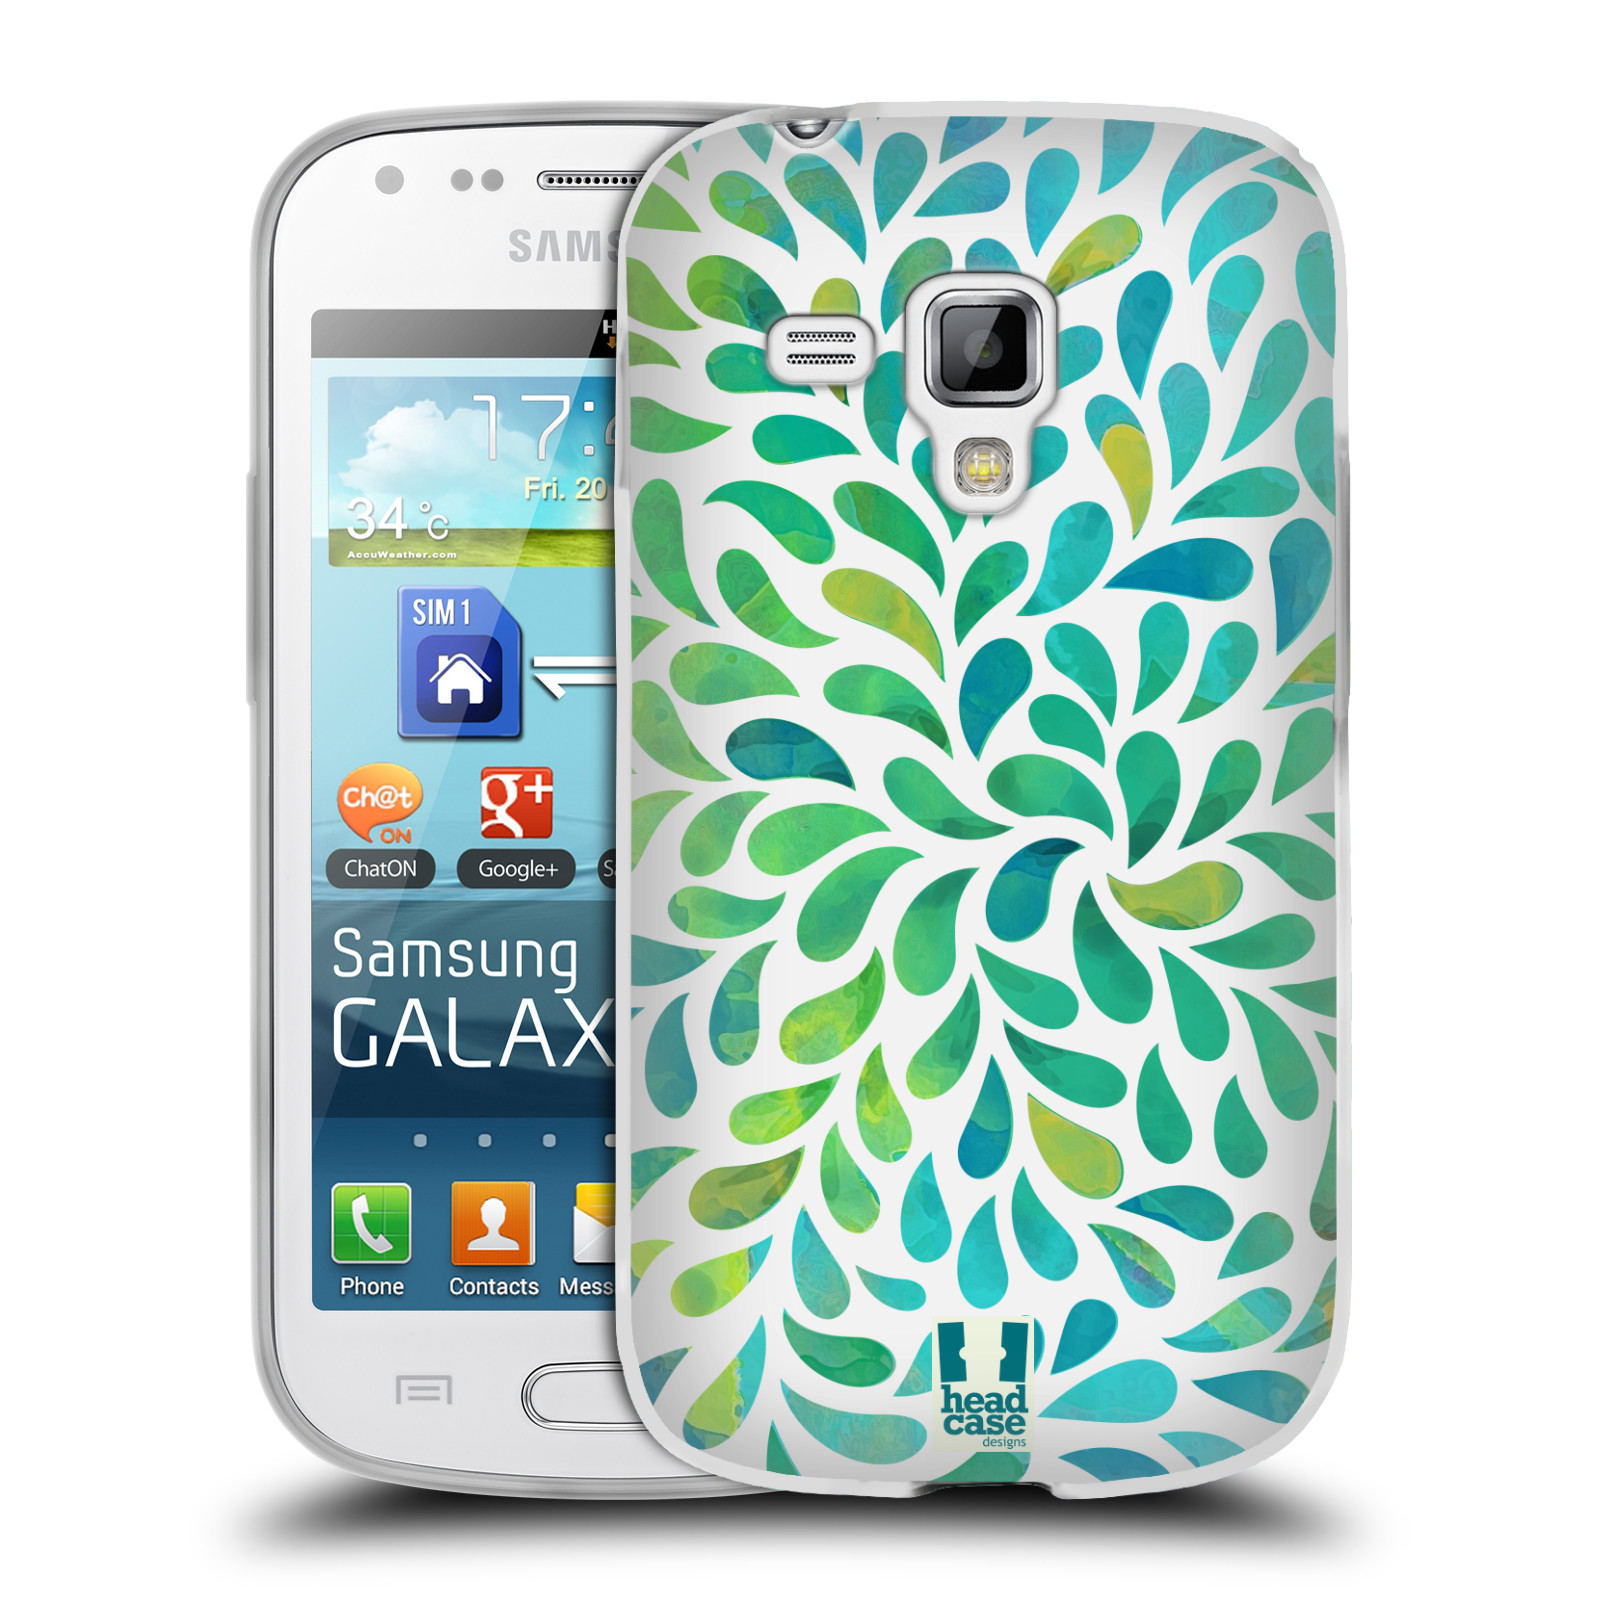 Silikonové pouzdro na mobil Samsung Galaxy S Duos 2 HEAD CASE Droplet Wave Kapičky (Silikonový kryt či obal na mobilní telefon Samsung Galaxy S Duos 2 GT-S7582)